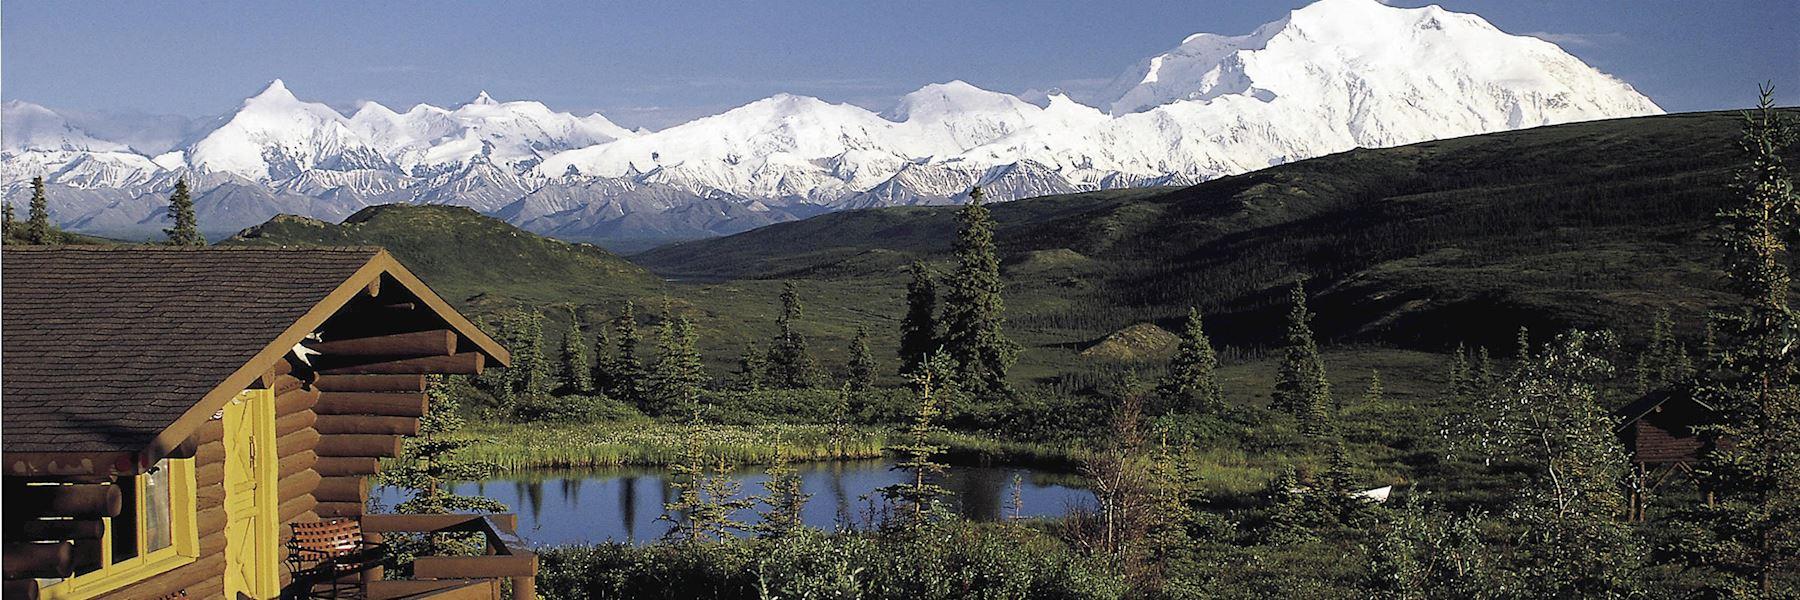 Accommodation in Alaska